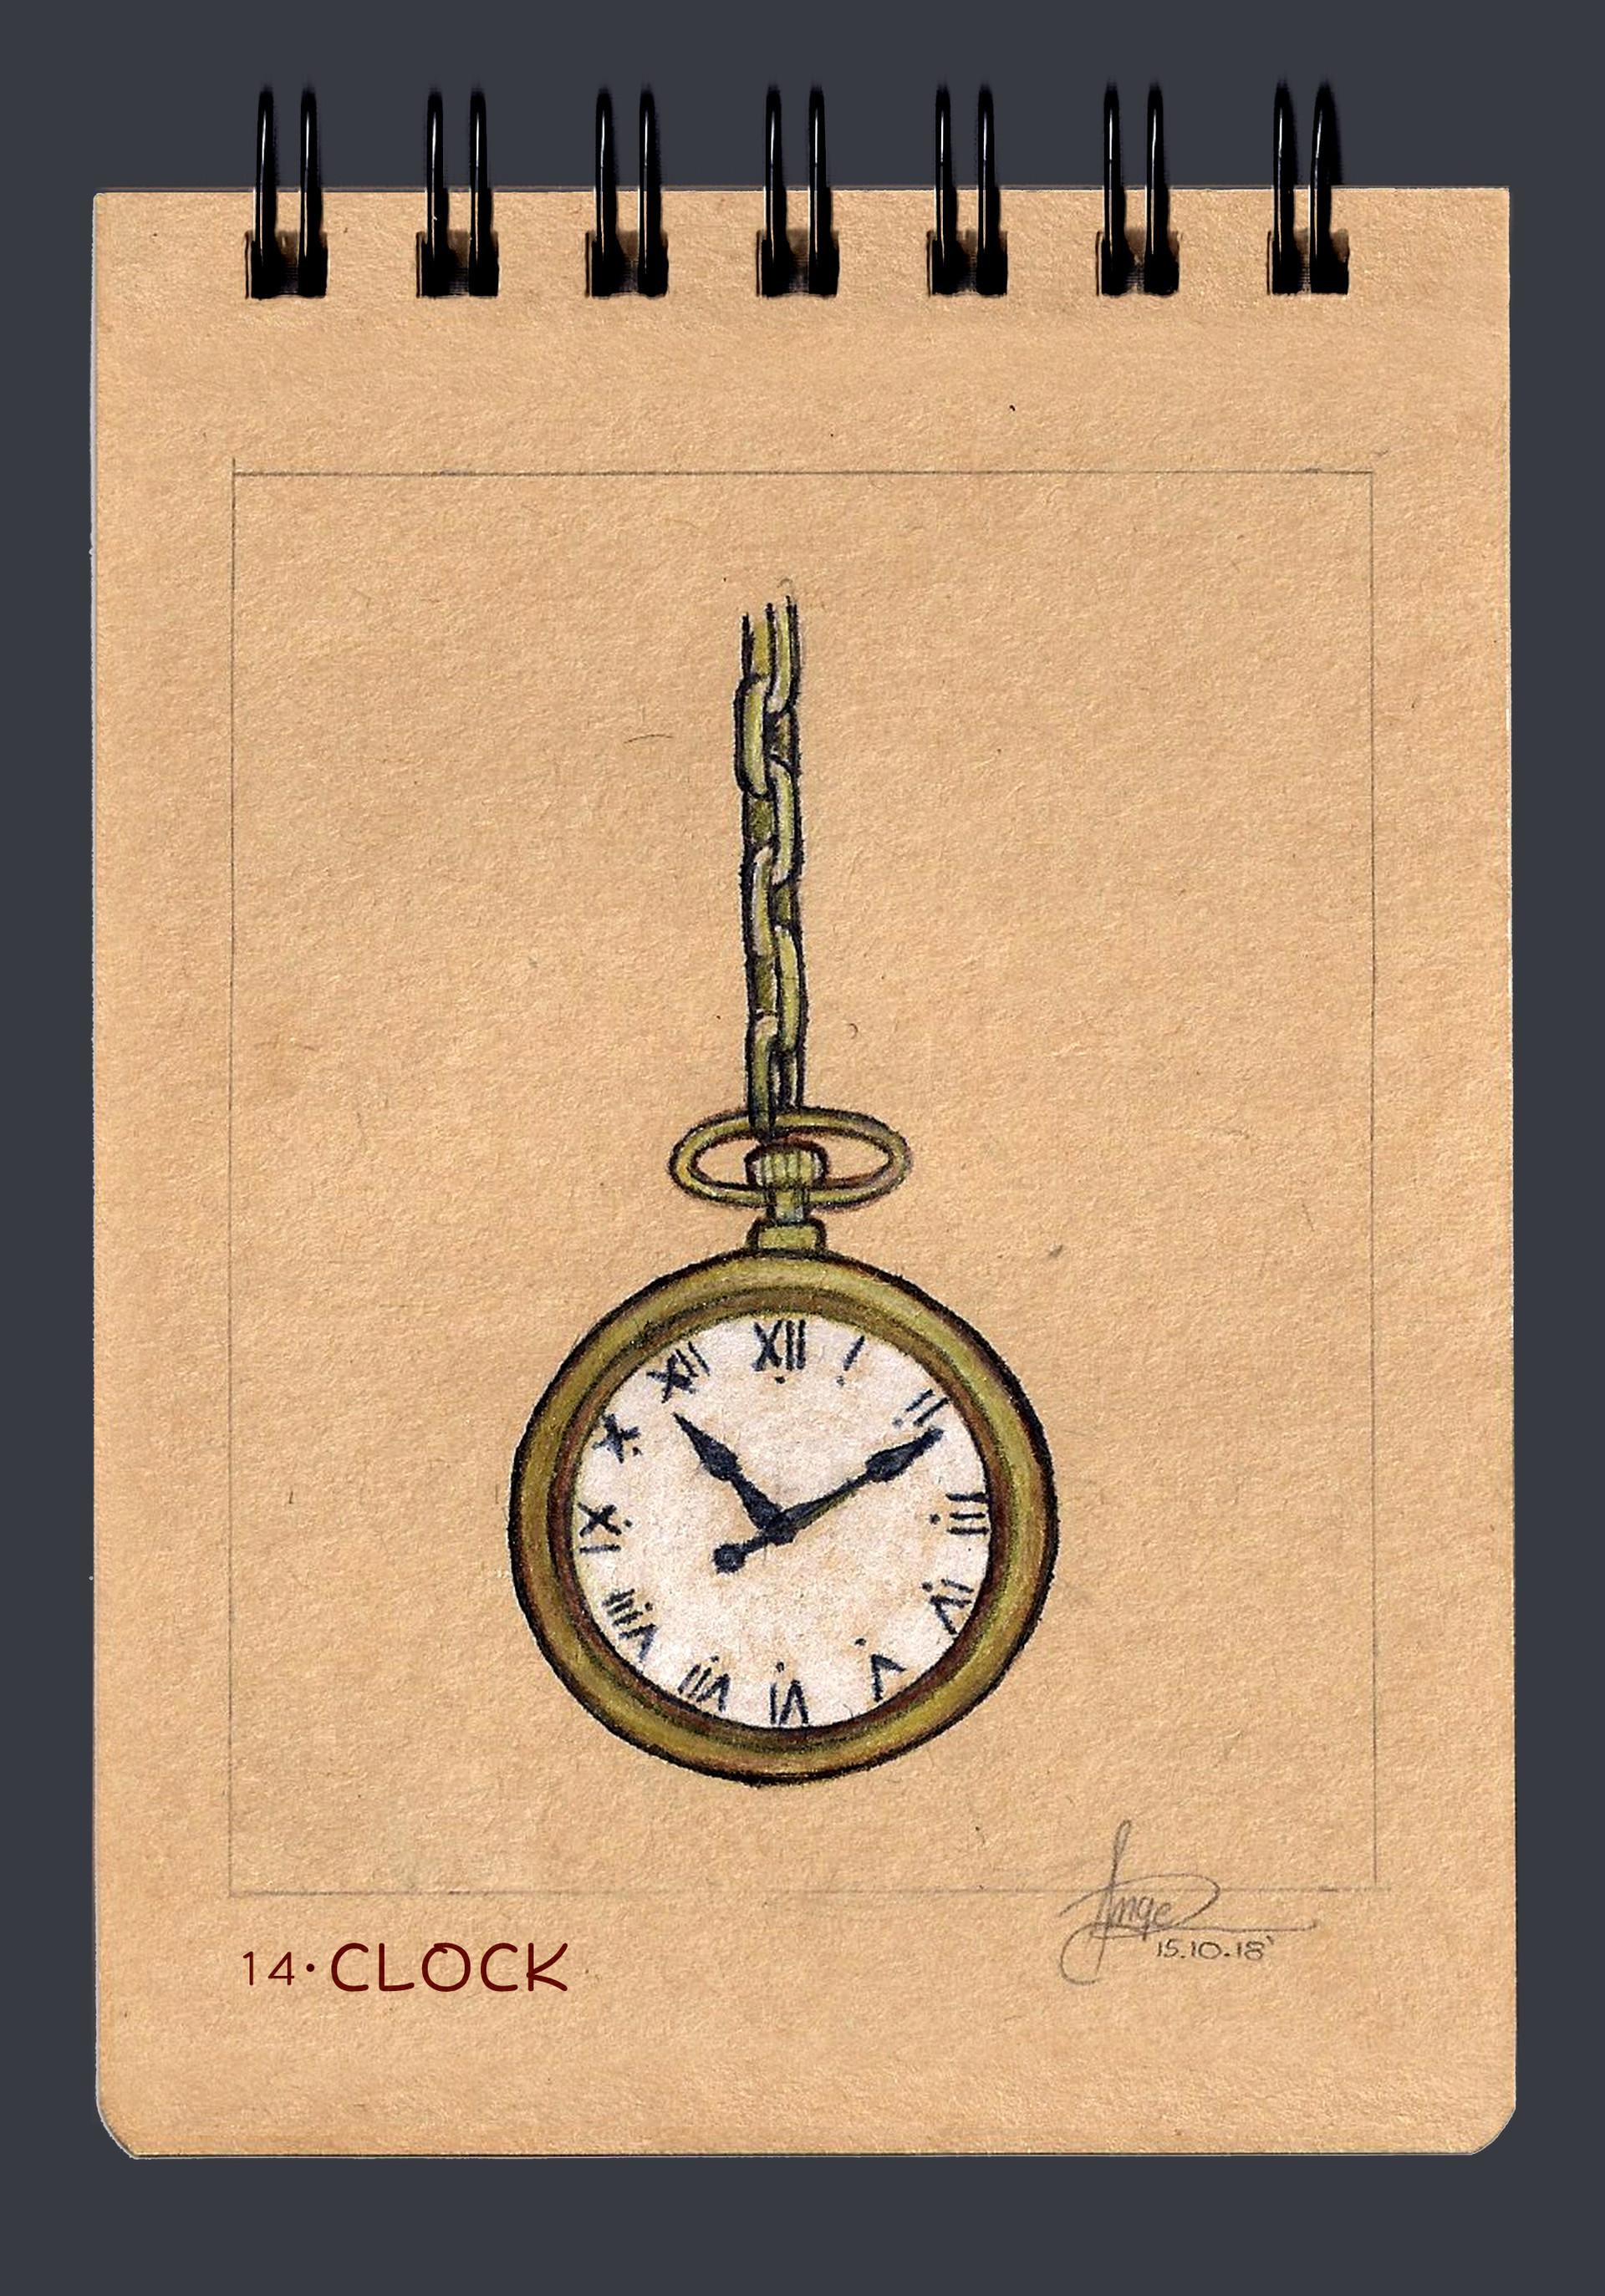 Angelica zurawski 181015b clock